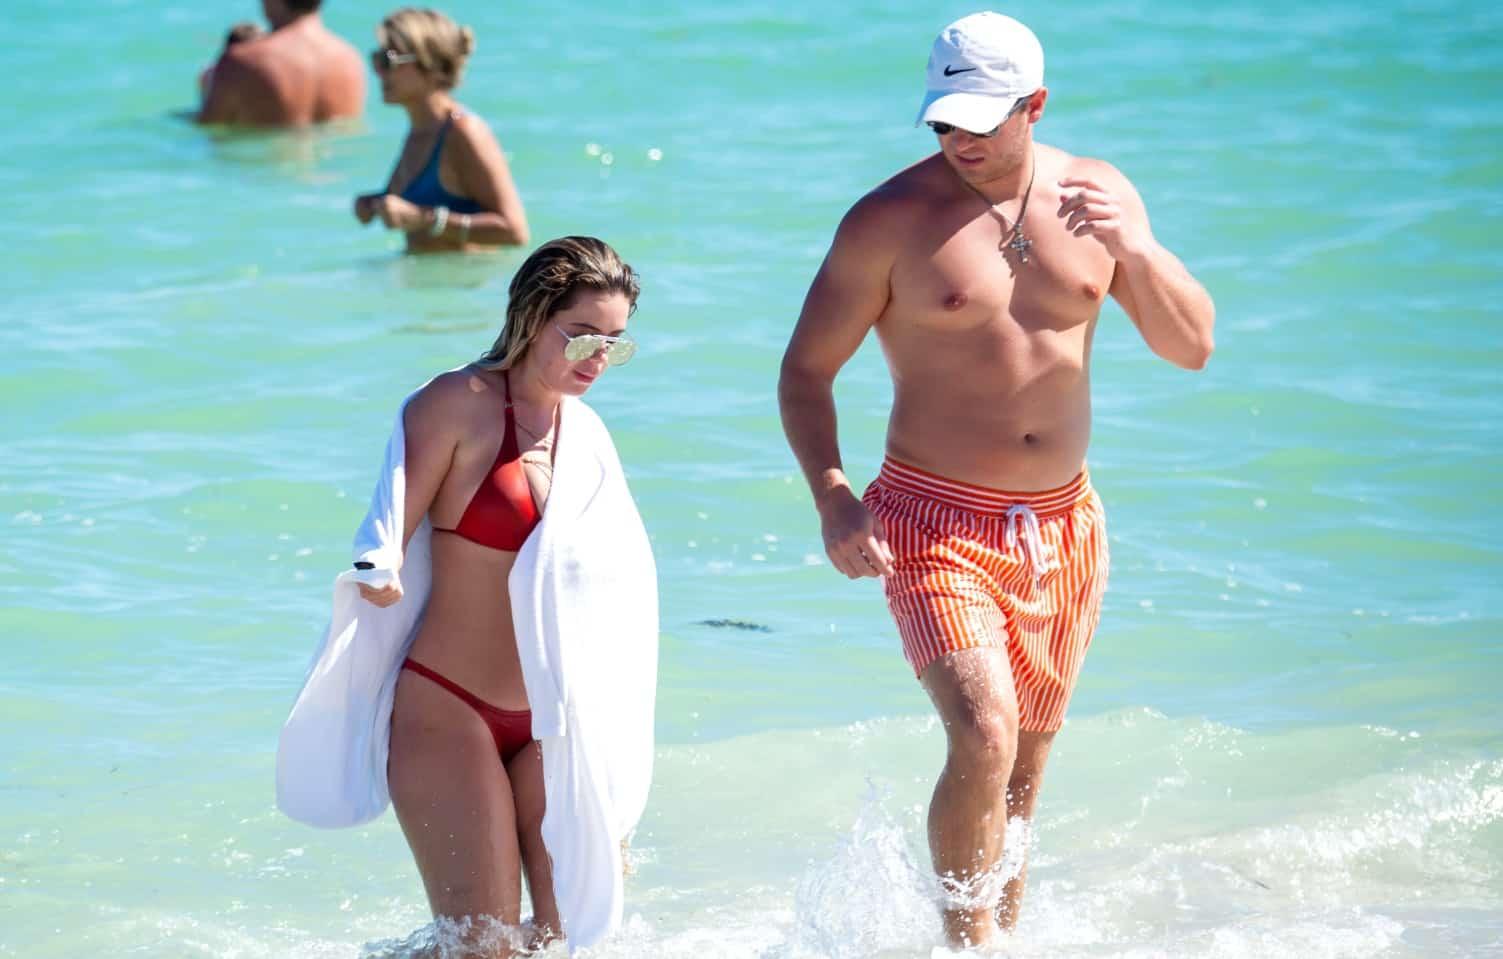 Brielle Biermann and boyfriend Slade Osborne Miami Beach